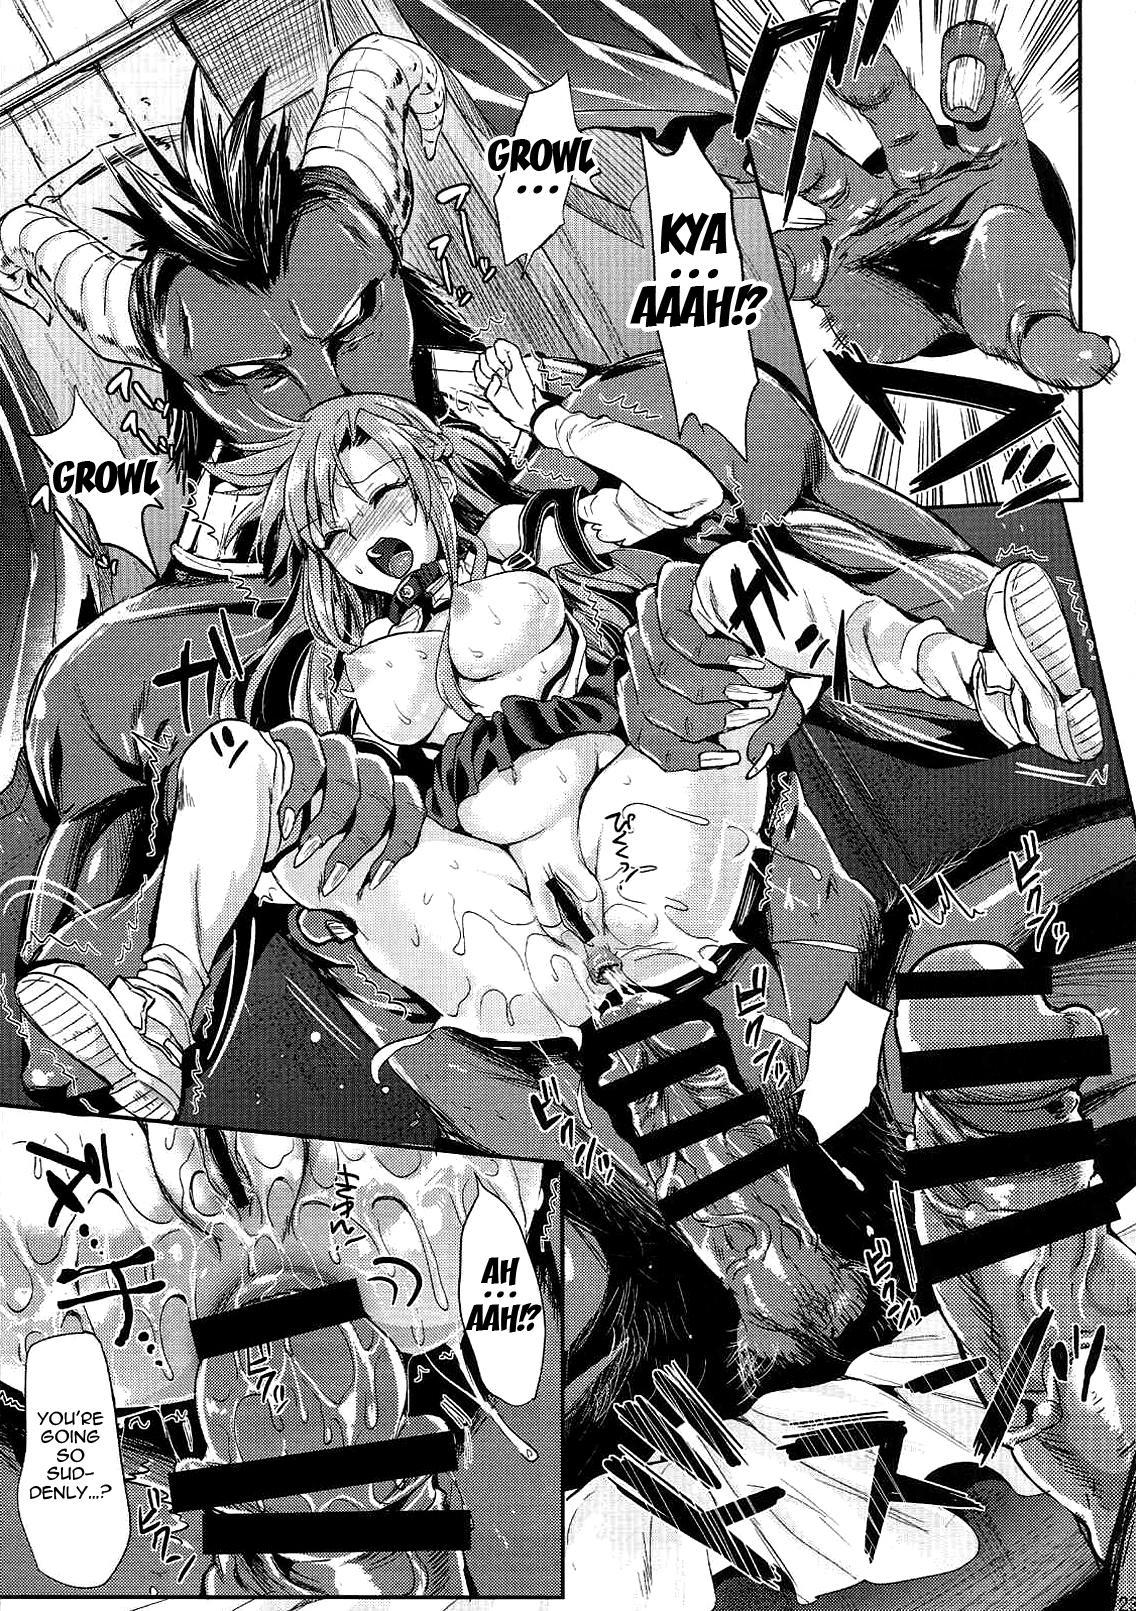 [YURIRU-RARIKA (Kojima Saya, Lazu)] Shujou Seikou 2 Bangai-hen | Captive Sex 2 - Extra Chapter (Sword Art Online) [English] {doujin-moe.us} 21